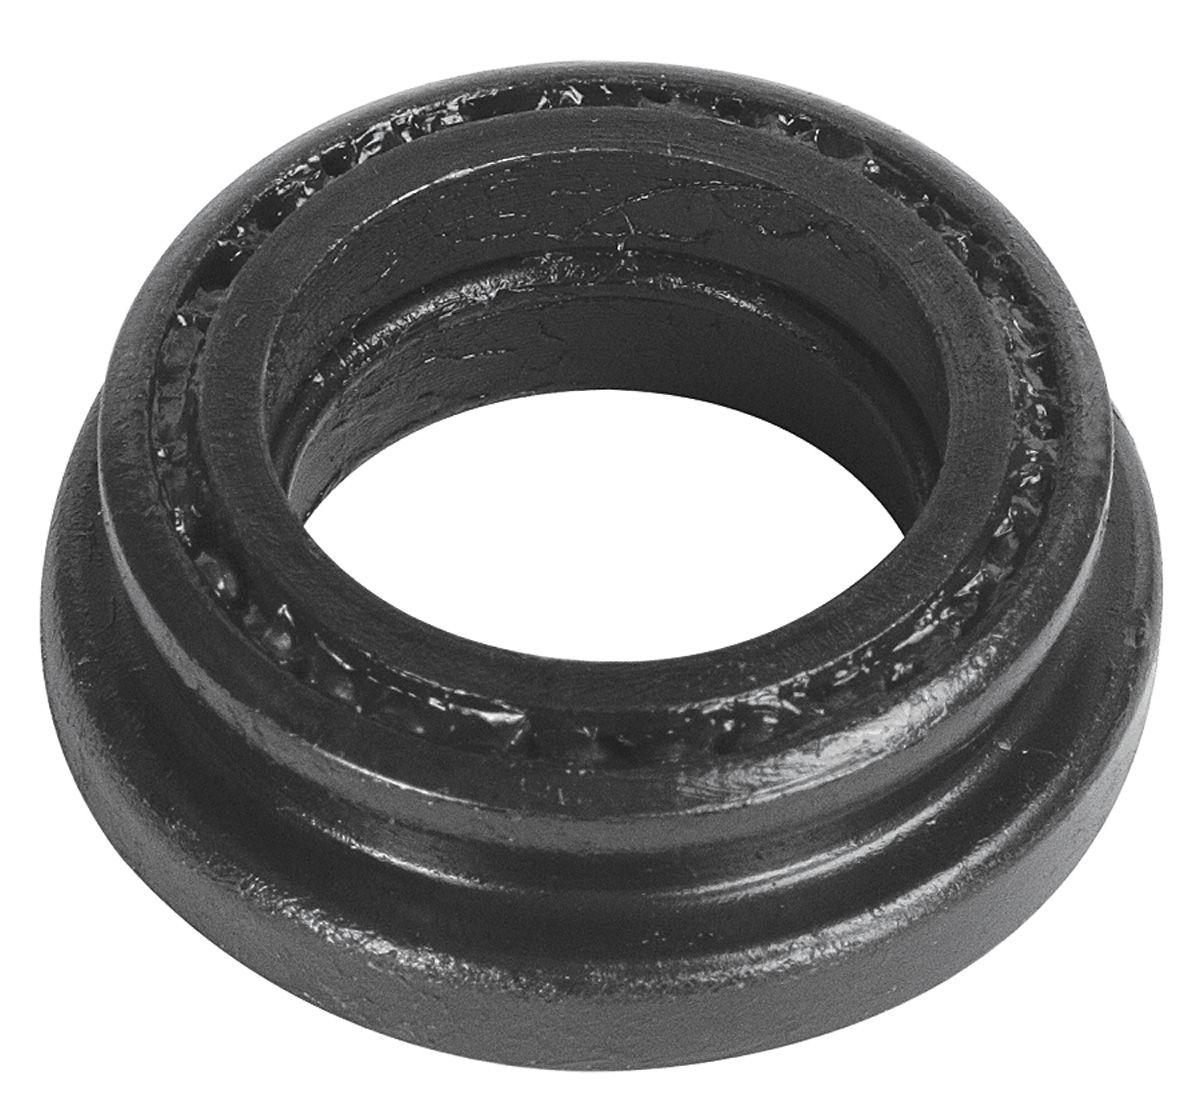 Bearing, Lower Steering Column, 1969-77 GM